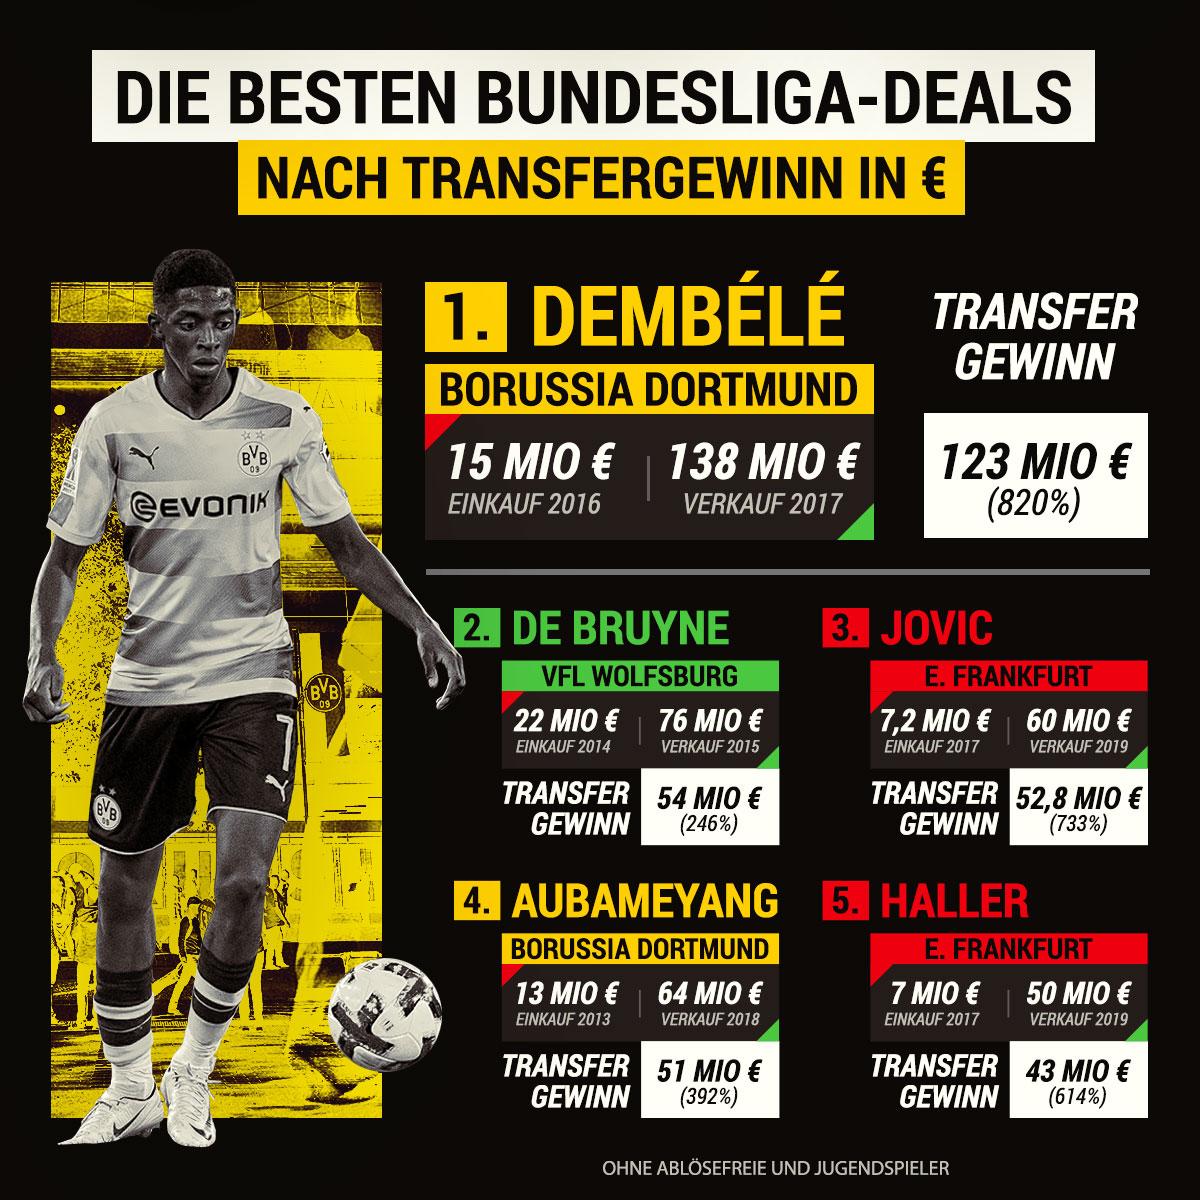 Die besten Transfer-Deals Bundesliga